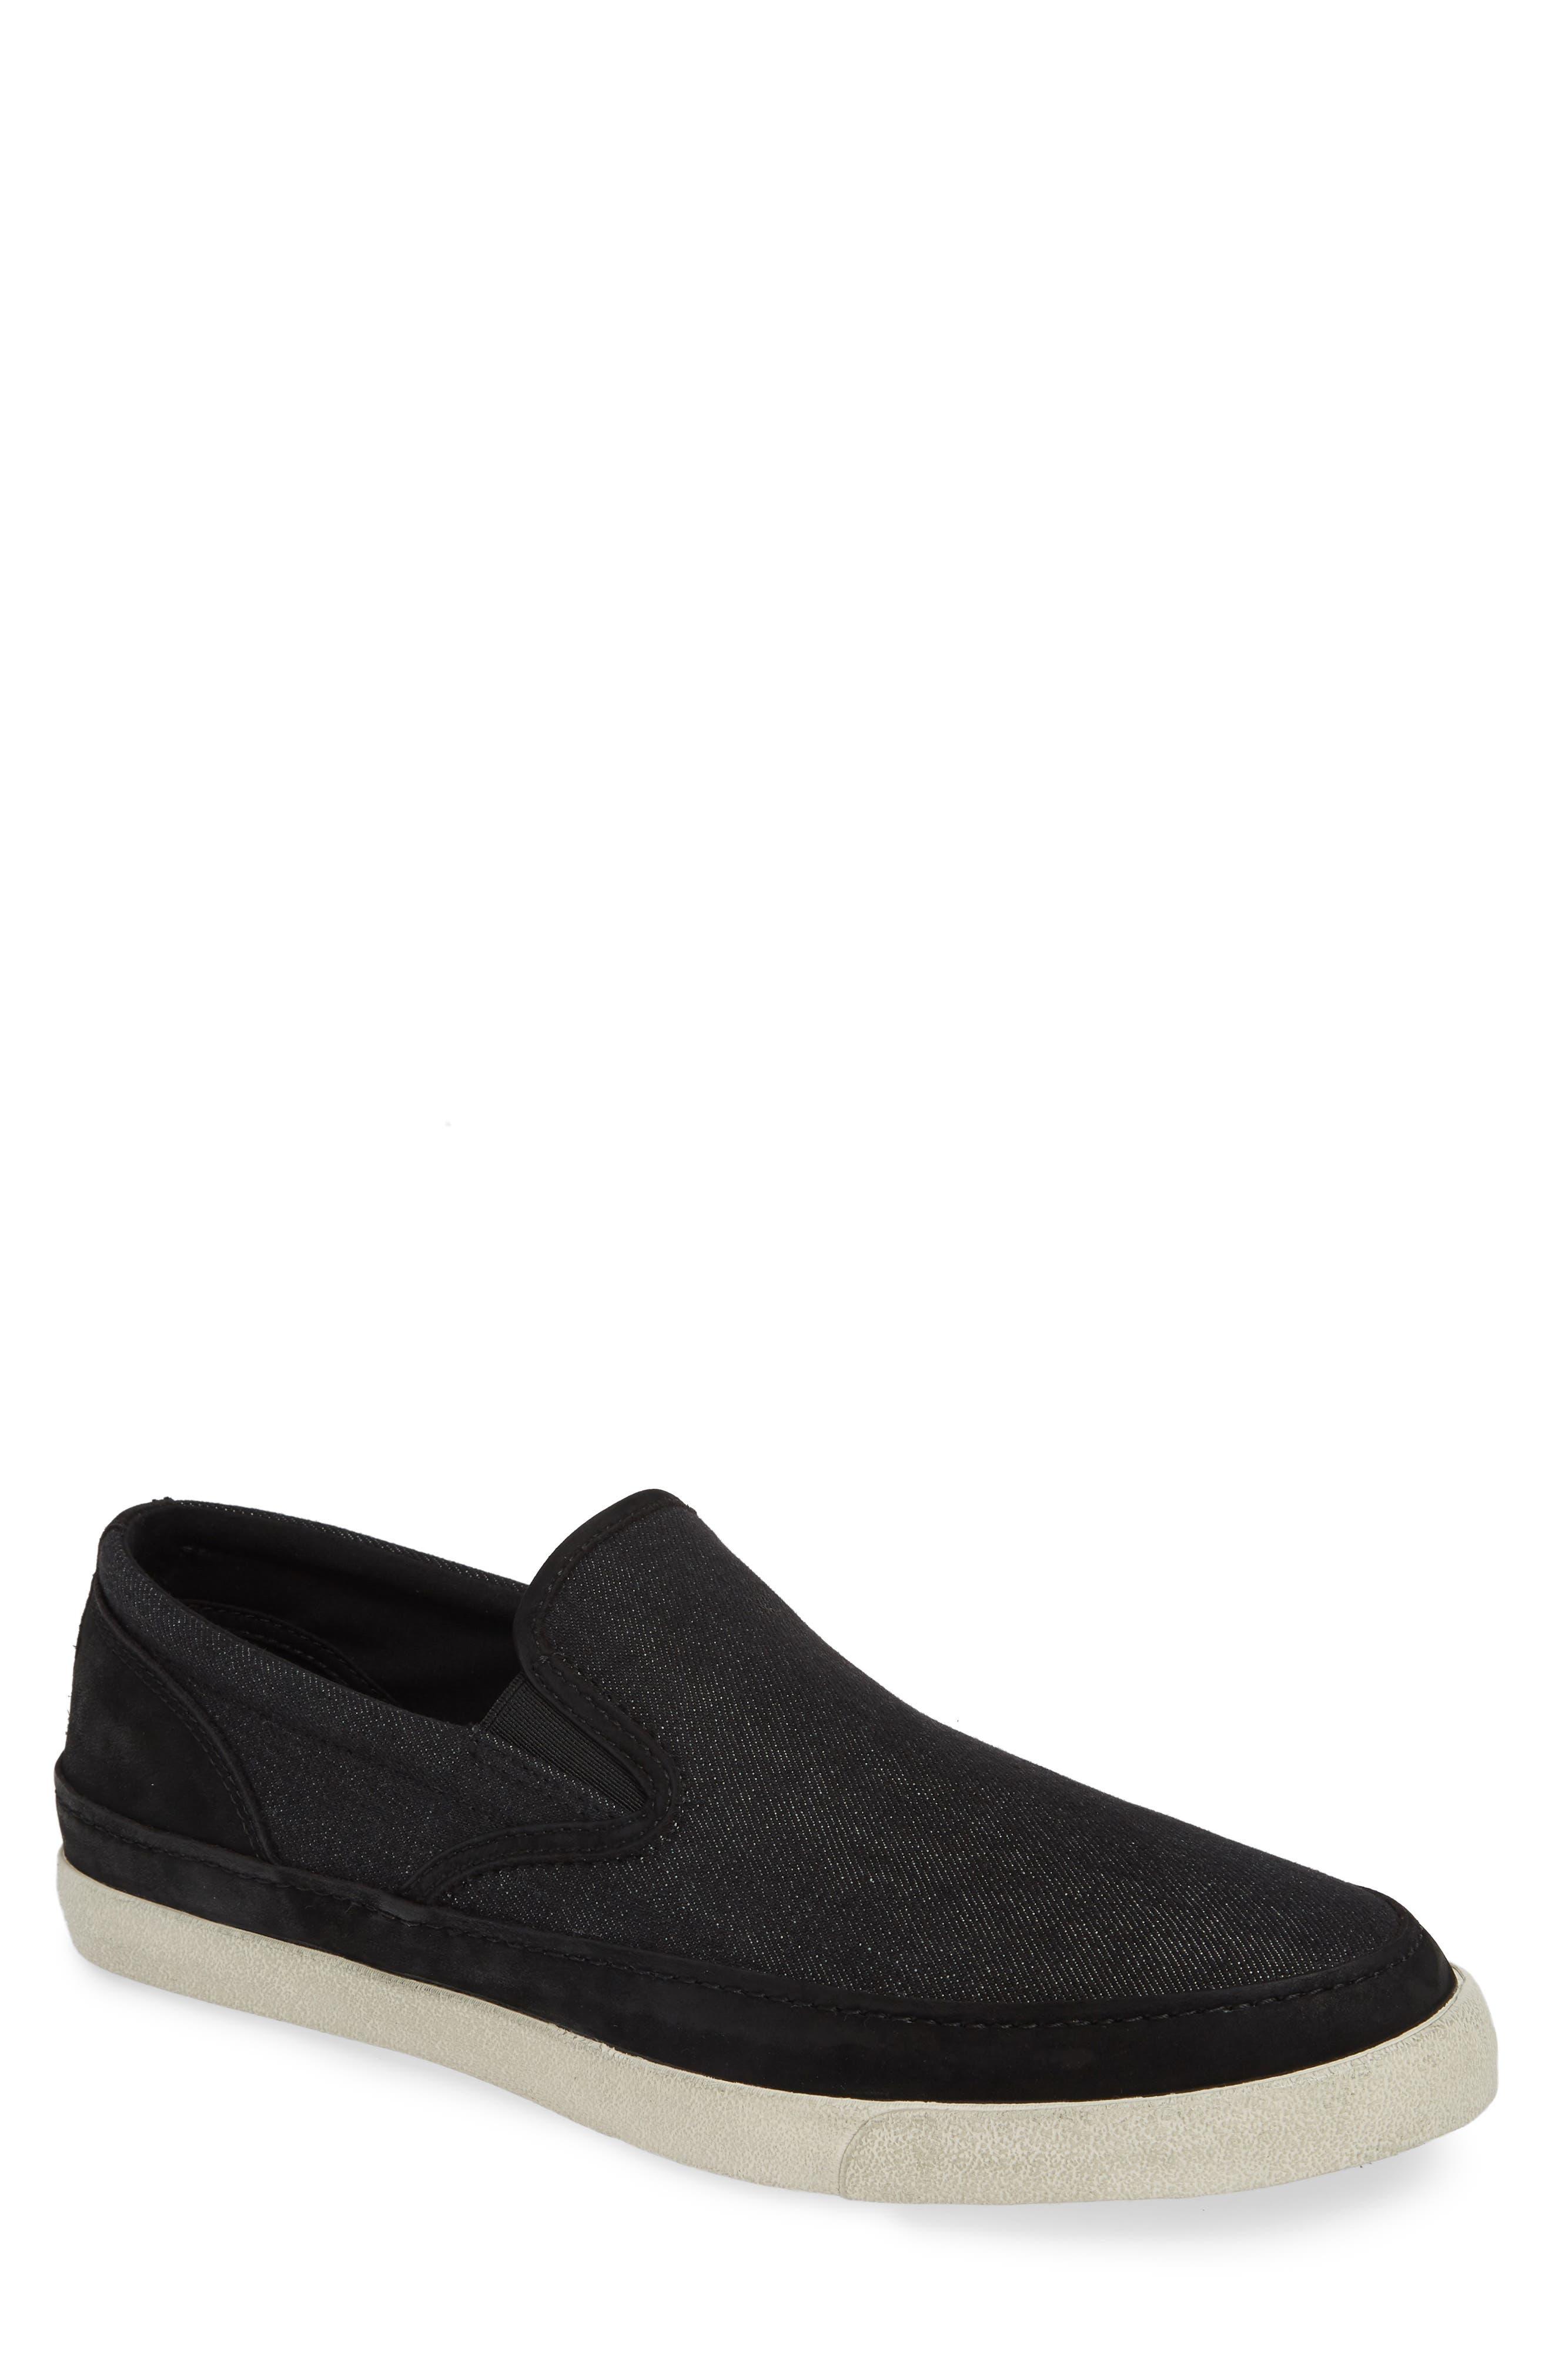 JOHN VARVATOS STAR USA Jet Canvas Slip-On Sneaker, Main, color, MINERAL BLK